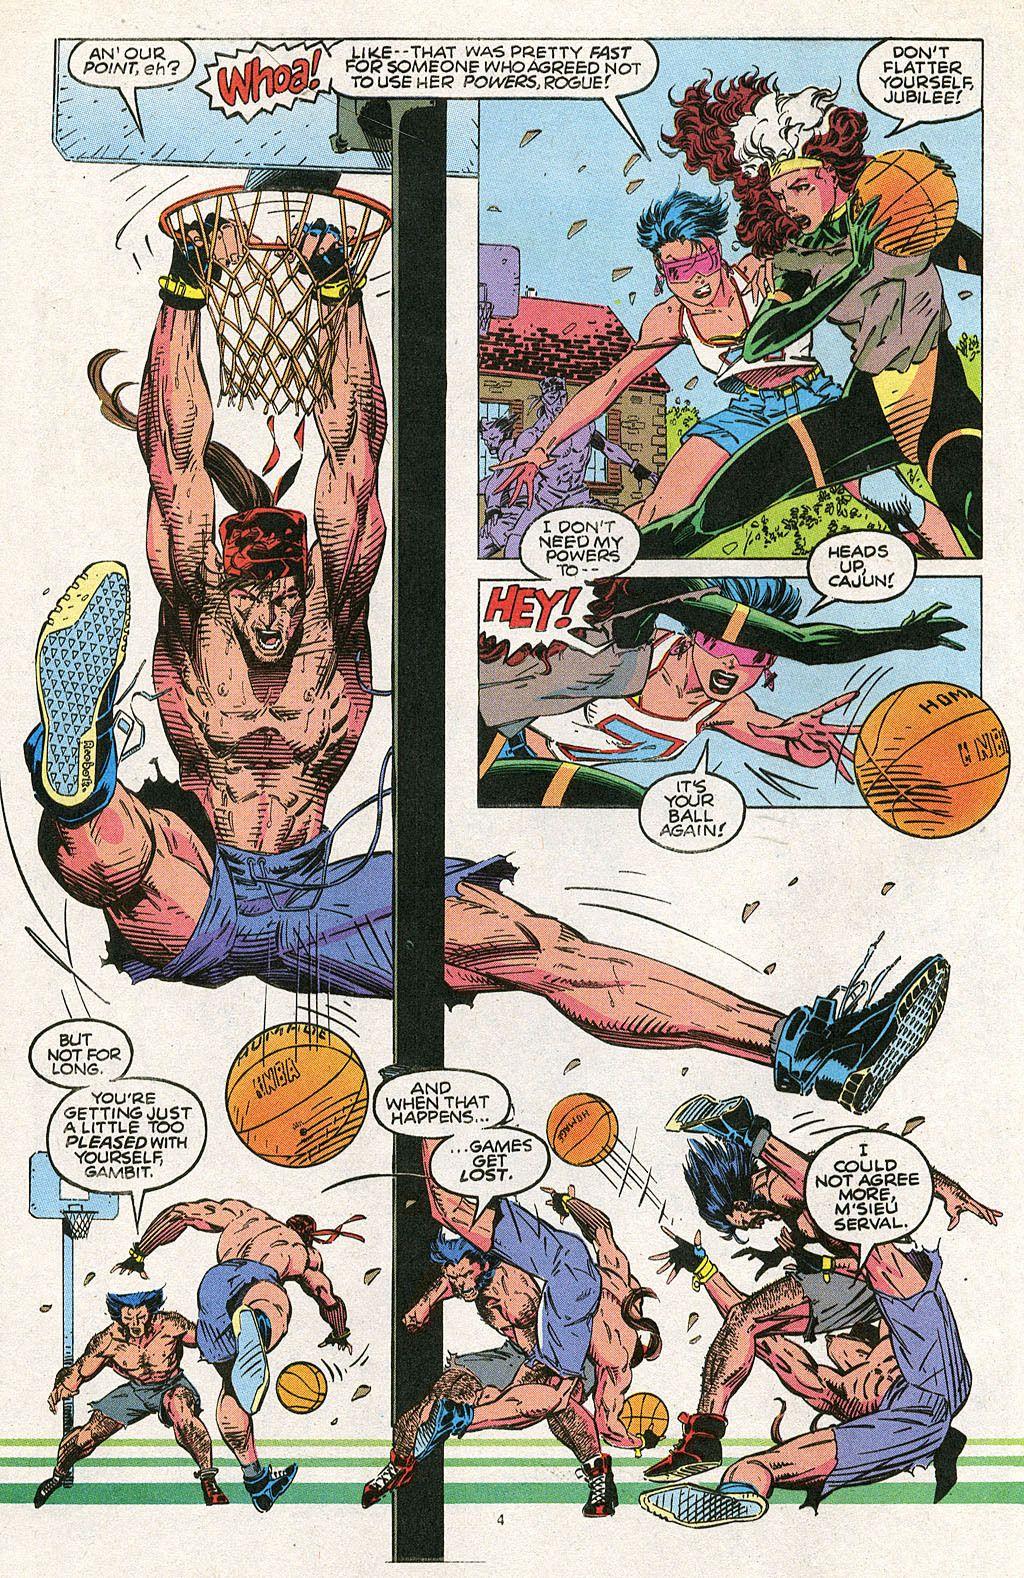 X Sports Blue Team Basketball Game By Jim Lee X Men Vol 2 4 Jim Lee Art Comics Comic Art